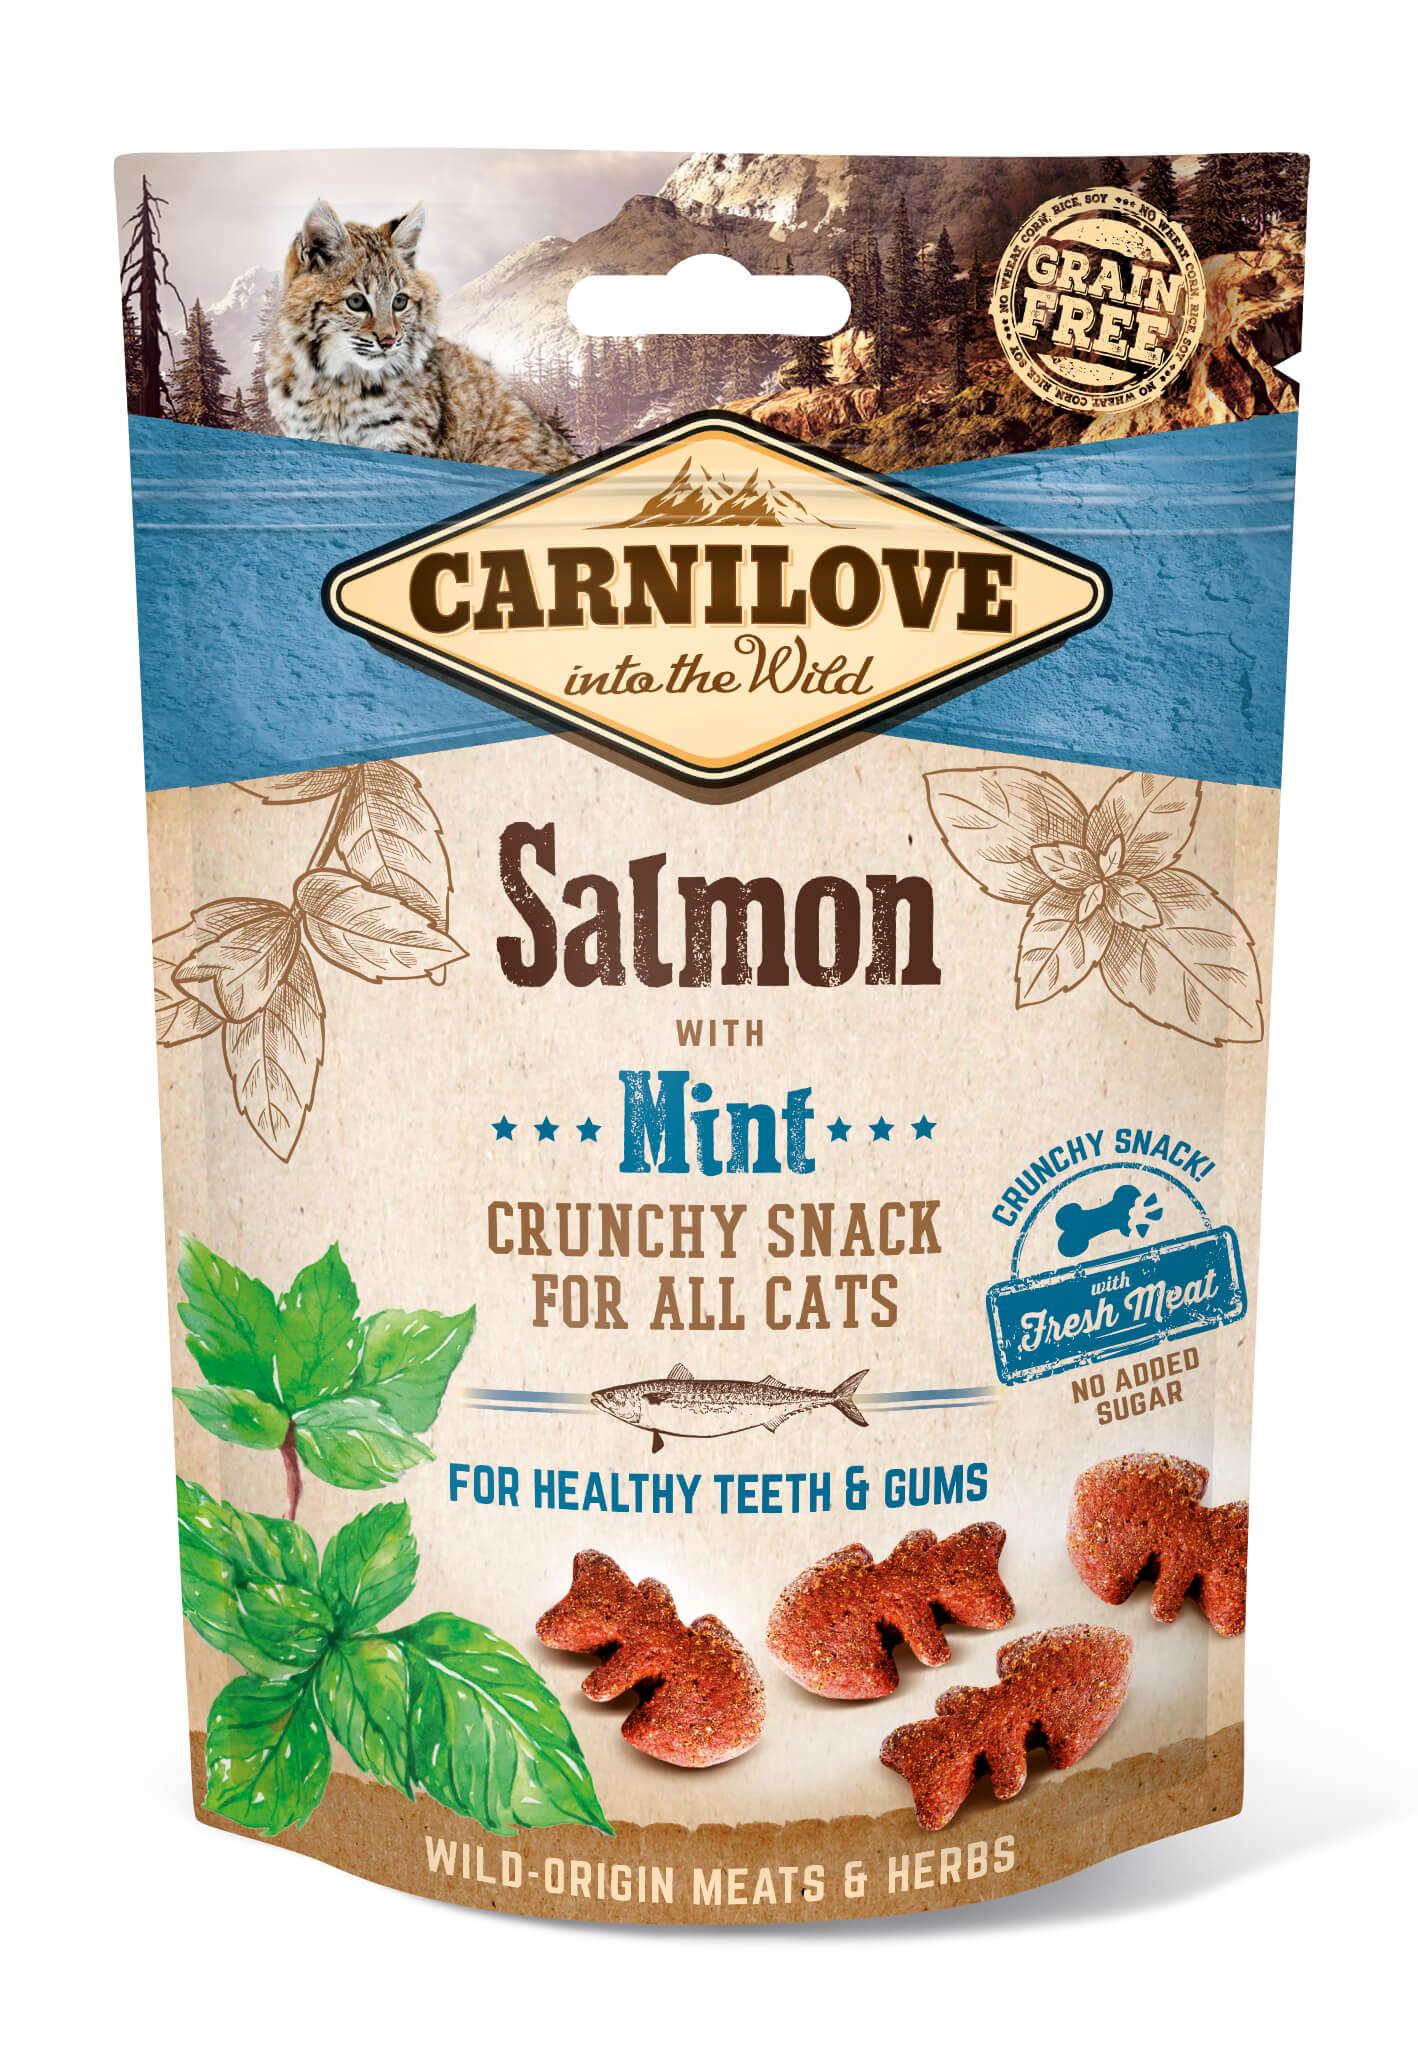 Carnilove Katze Crunchy Snack – Salmon with Mint